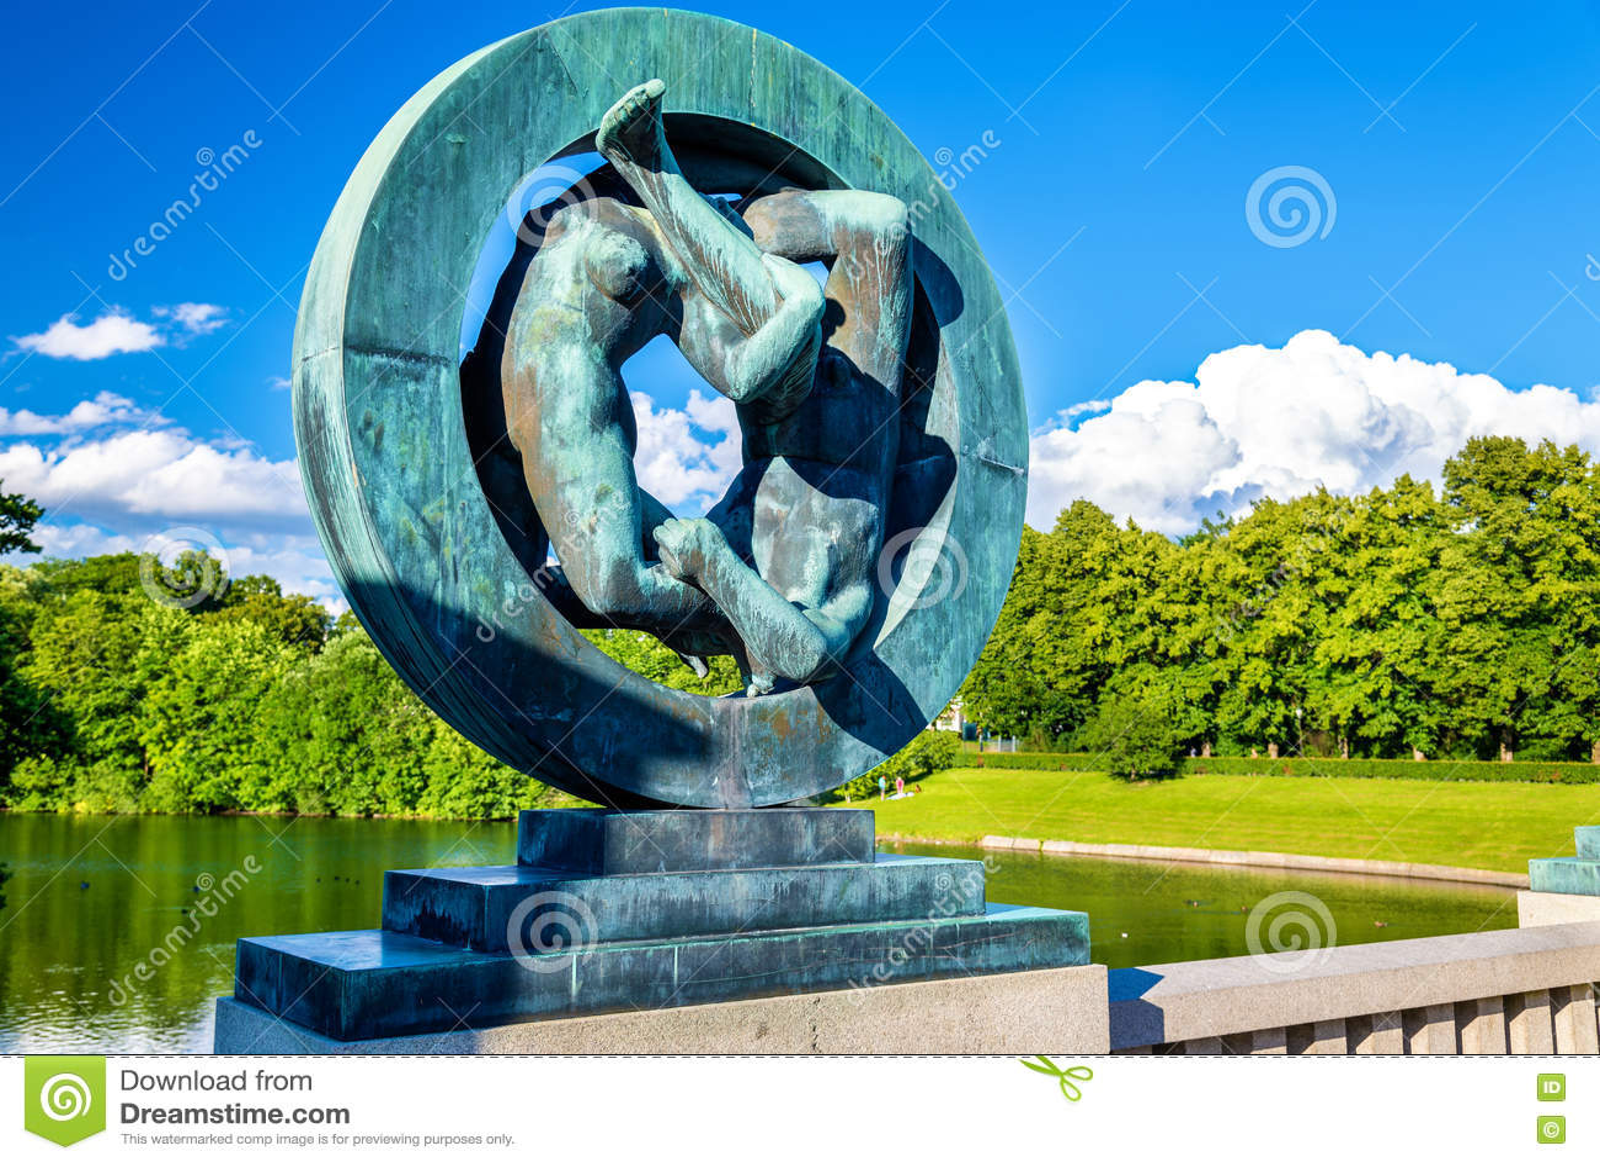 Les installations de sculpture en Vigeland dans Frogner garent - Oslo